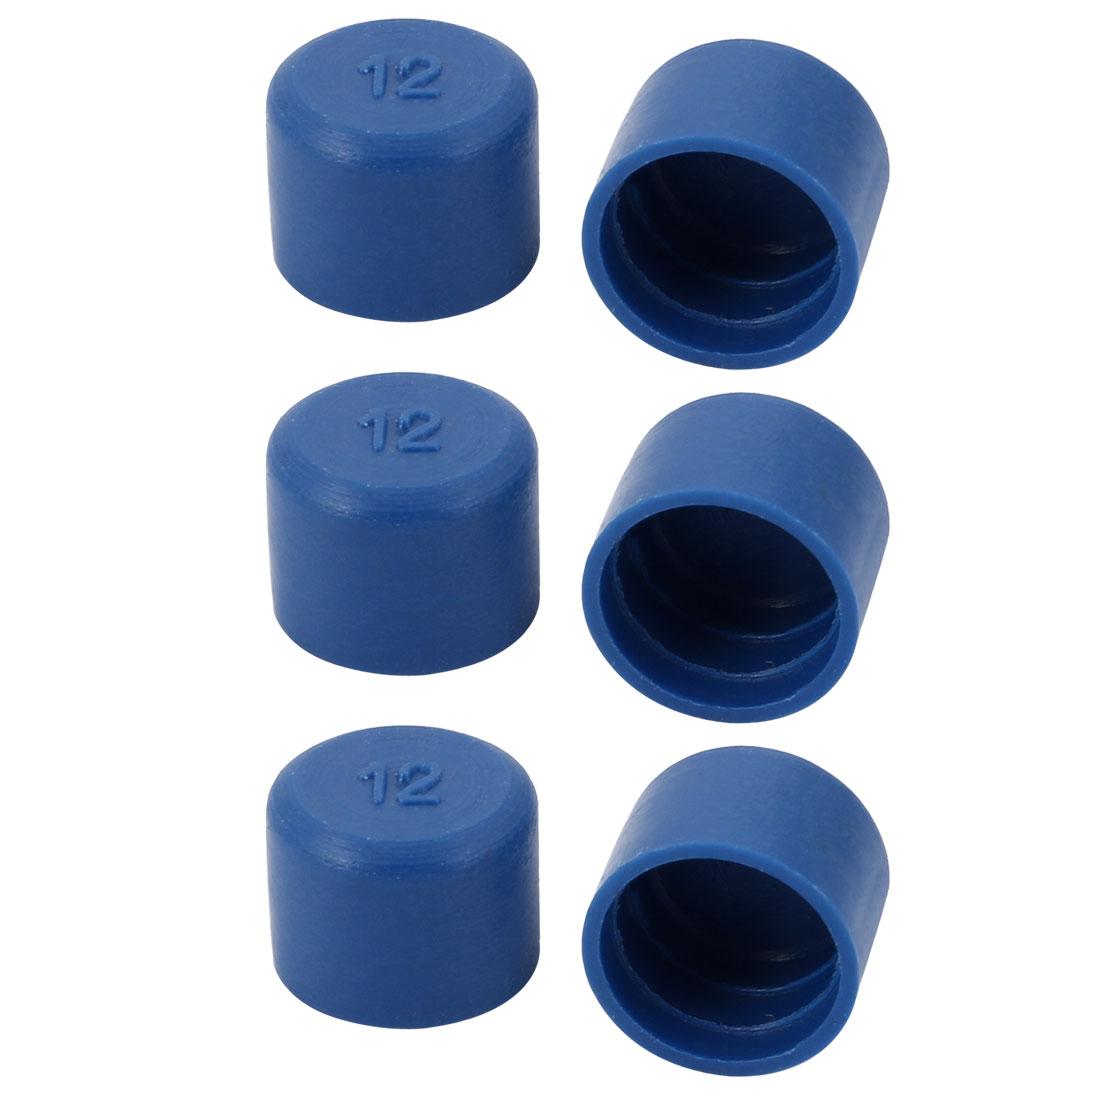 6pcs 12mm Inner Dia PE Plastic End Cap Bolt Thread Protector Tube Cover Blue